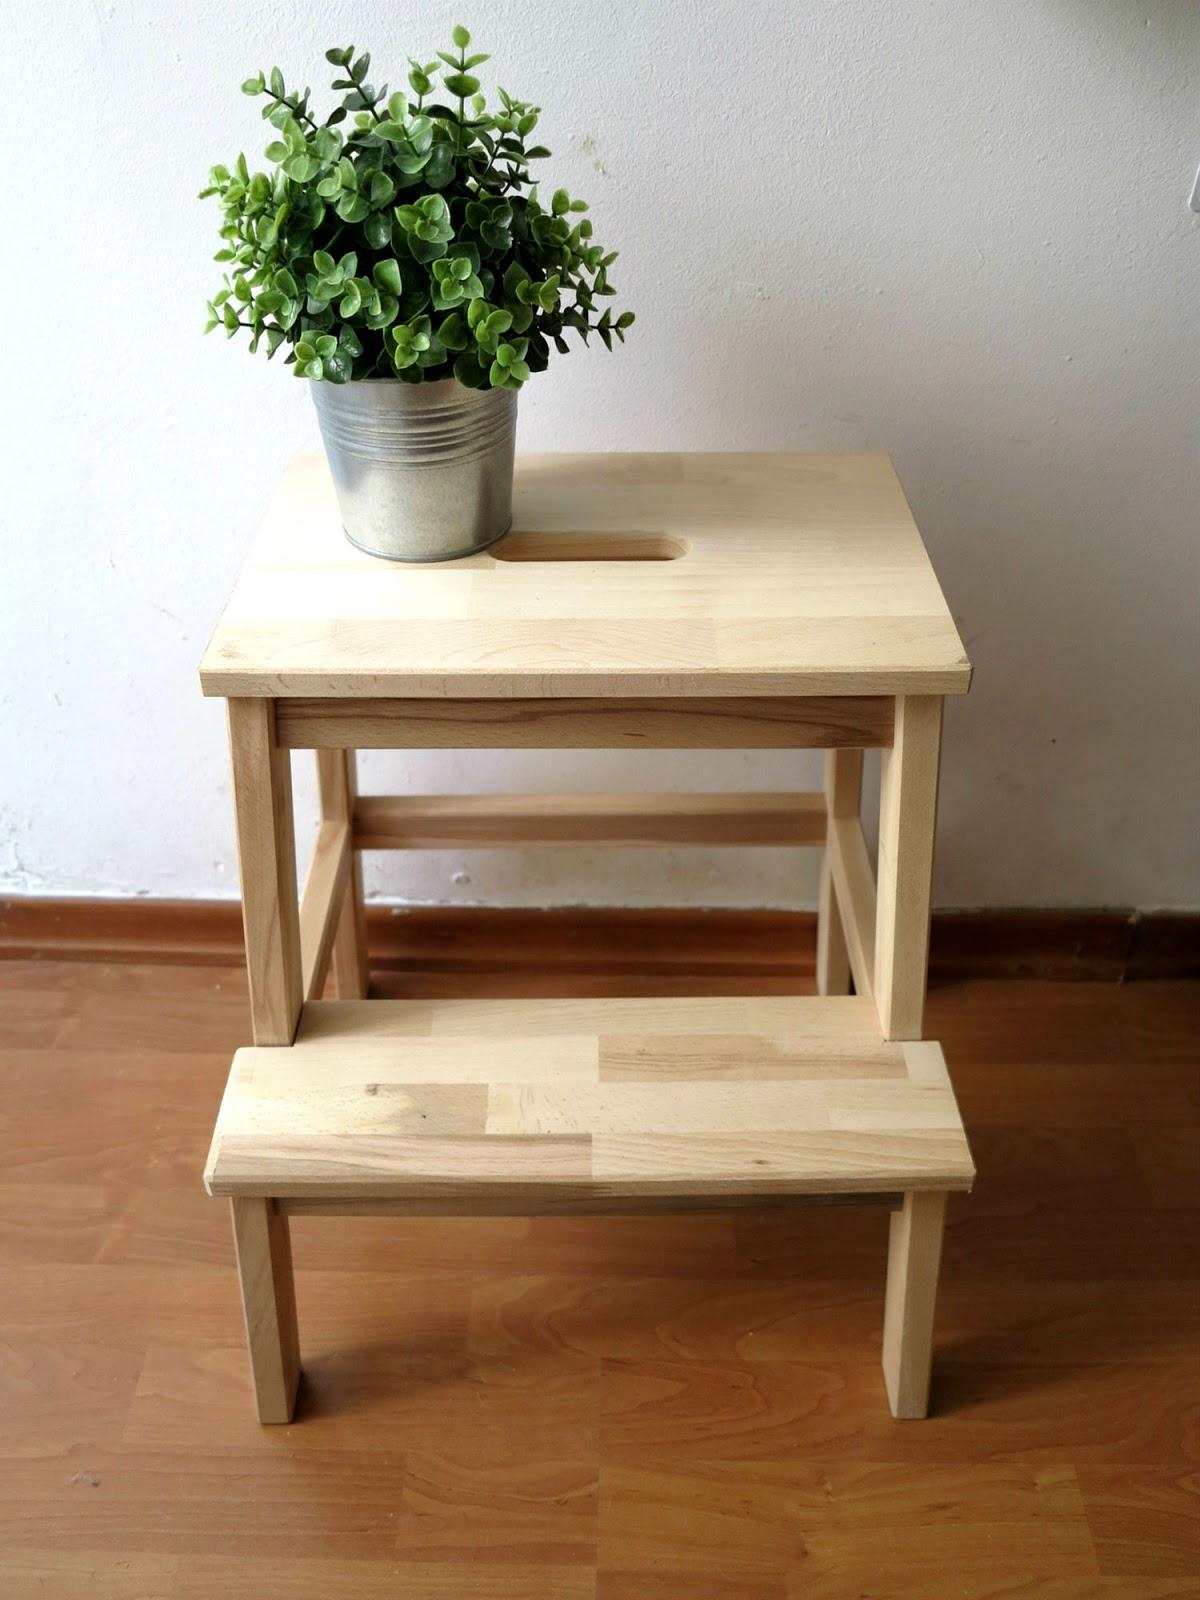 Escalera madera leroy merlin fabulous decoracin - Escaleras de madera ikea ...